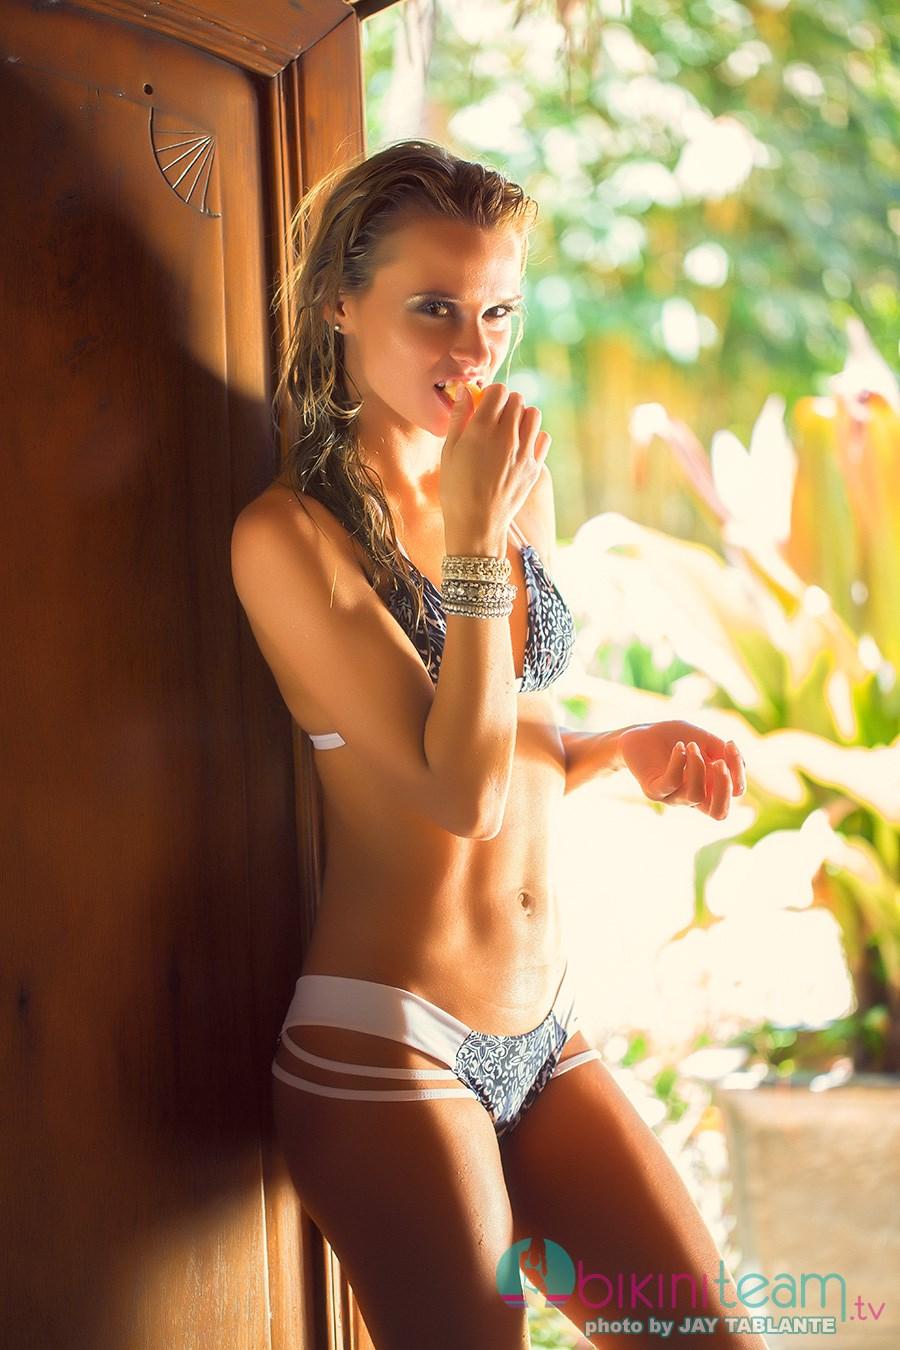 model Older portfolio bikini